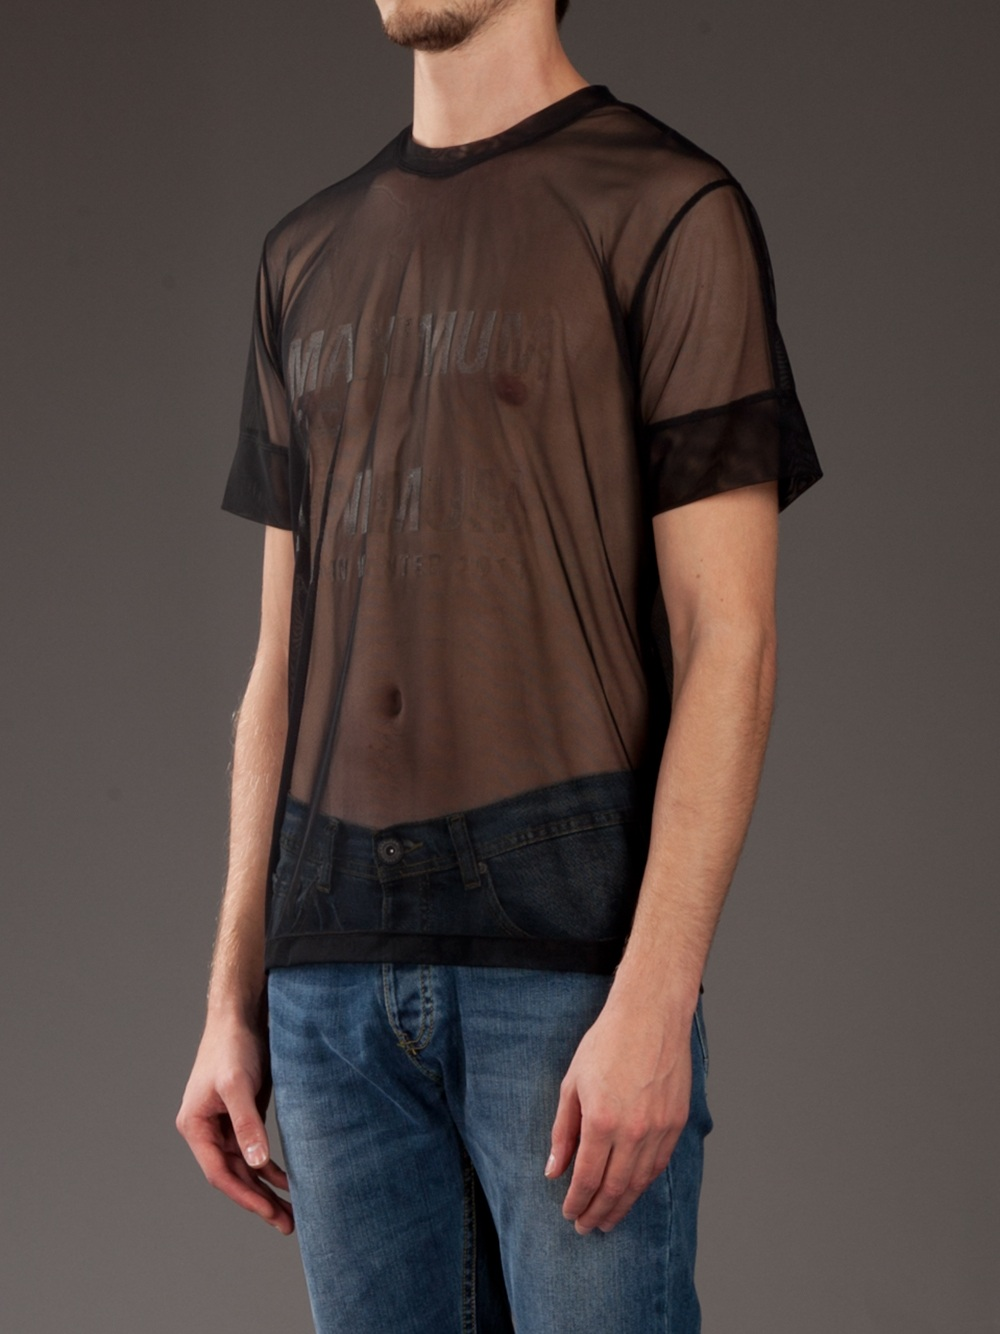 Blaak Printed Mesh T Shirt In Black For Men Lyst